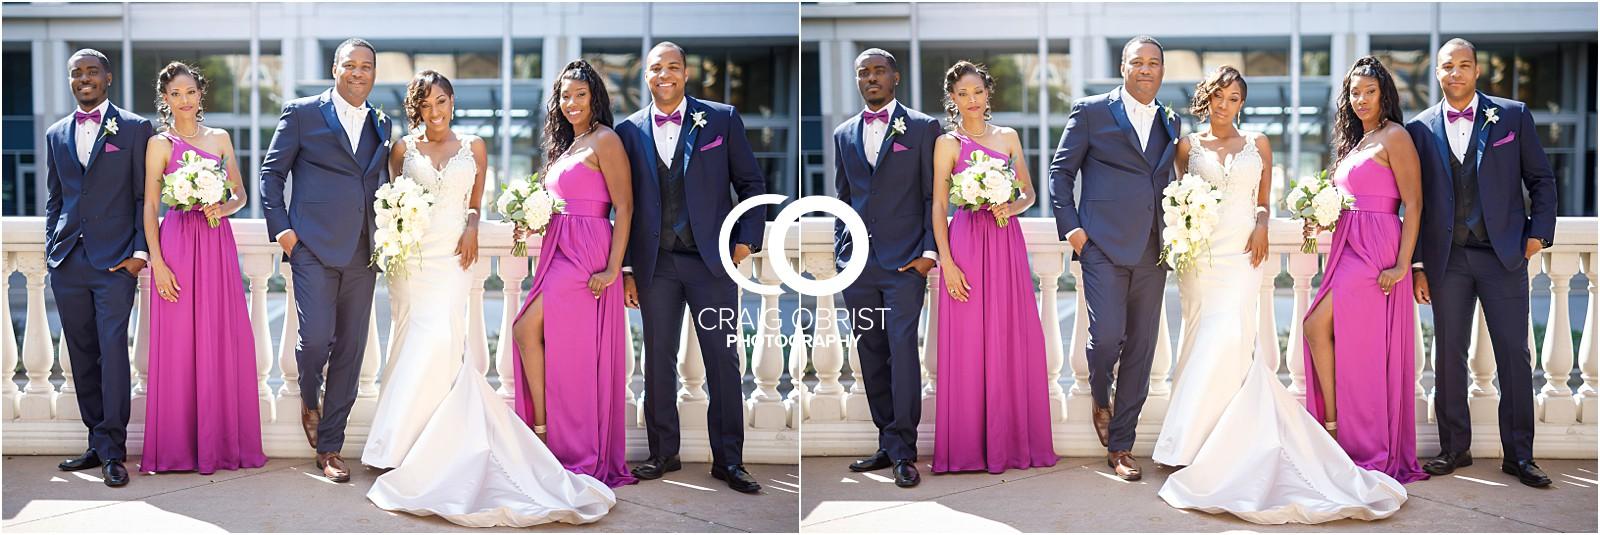 Villa Christina Atlanta Wedding Photographer_0041.jpg